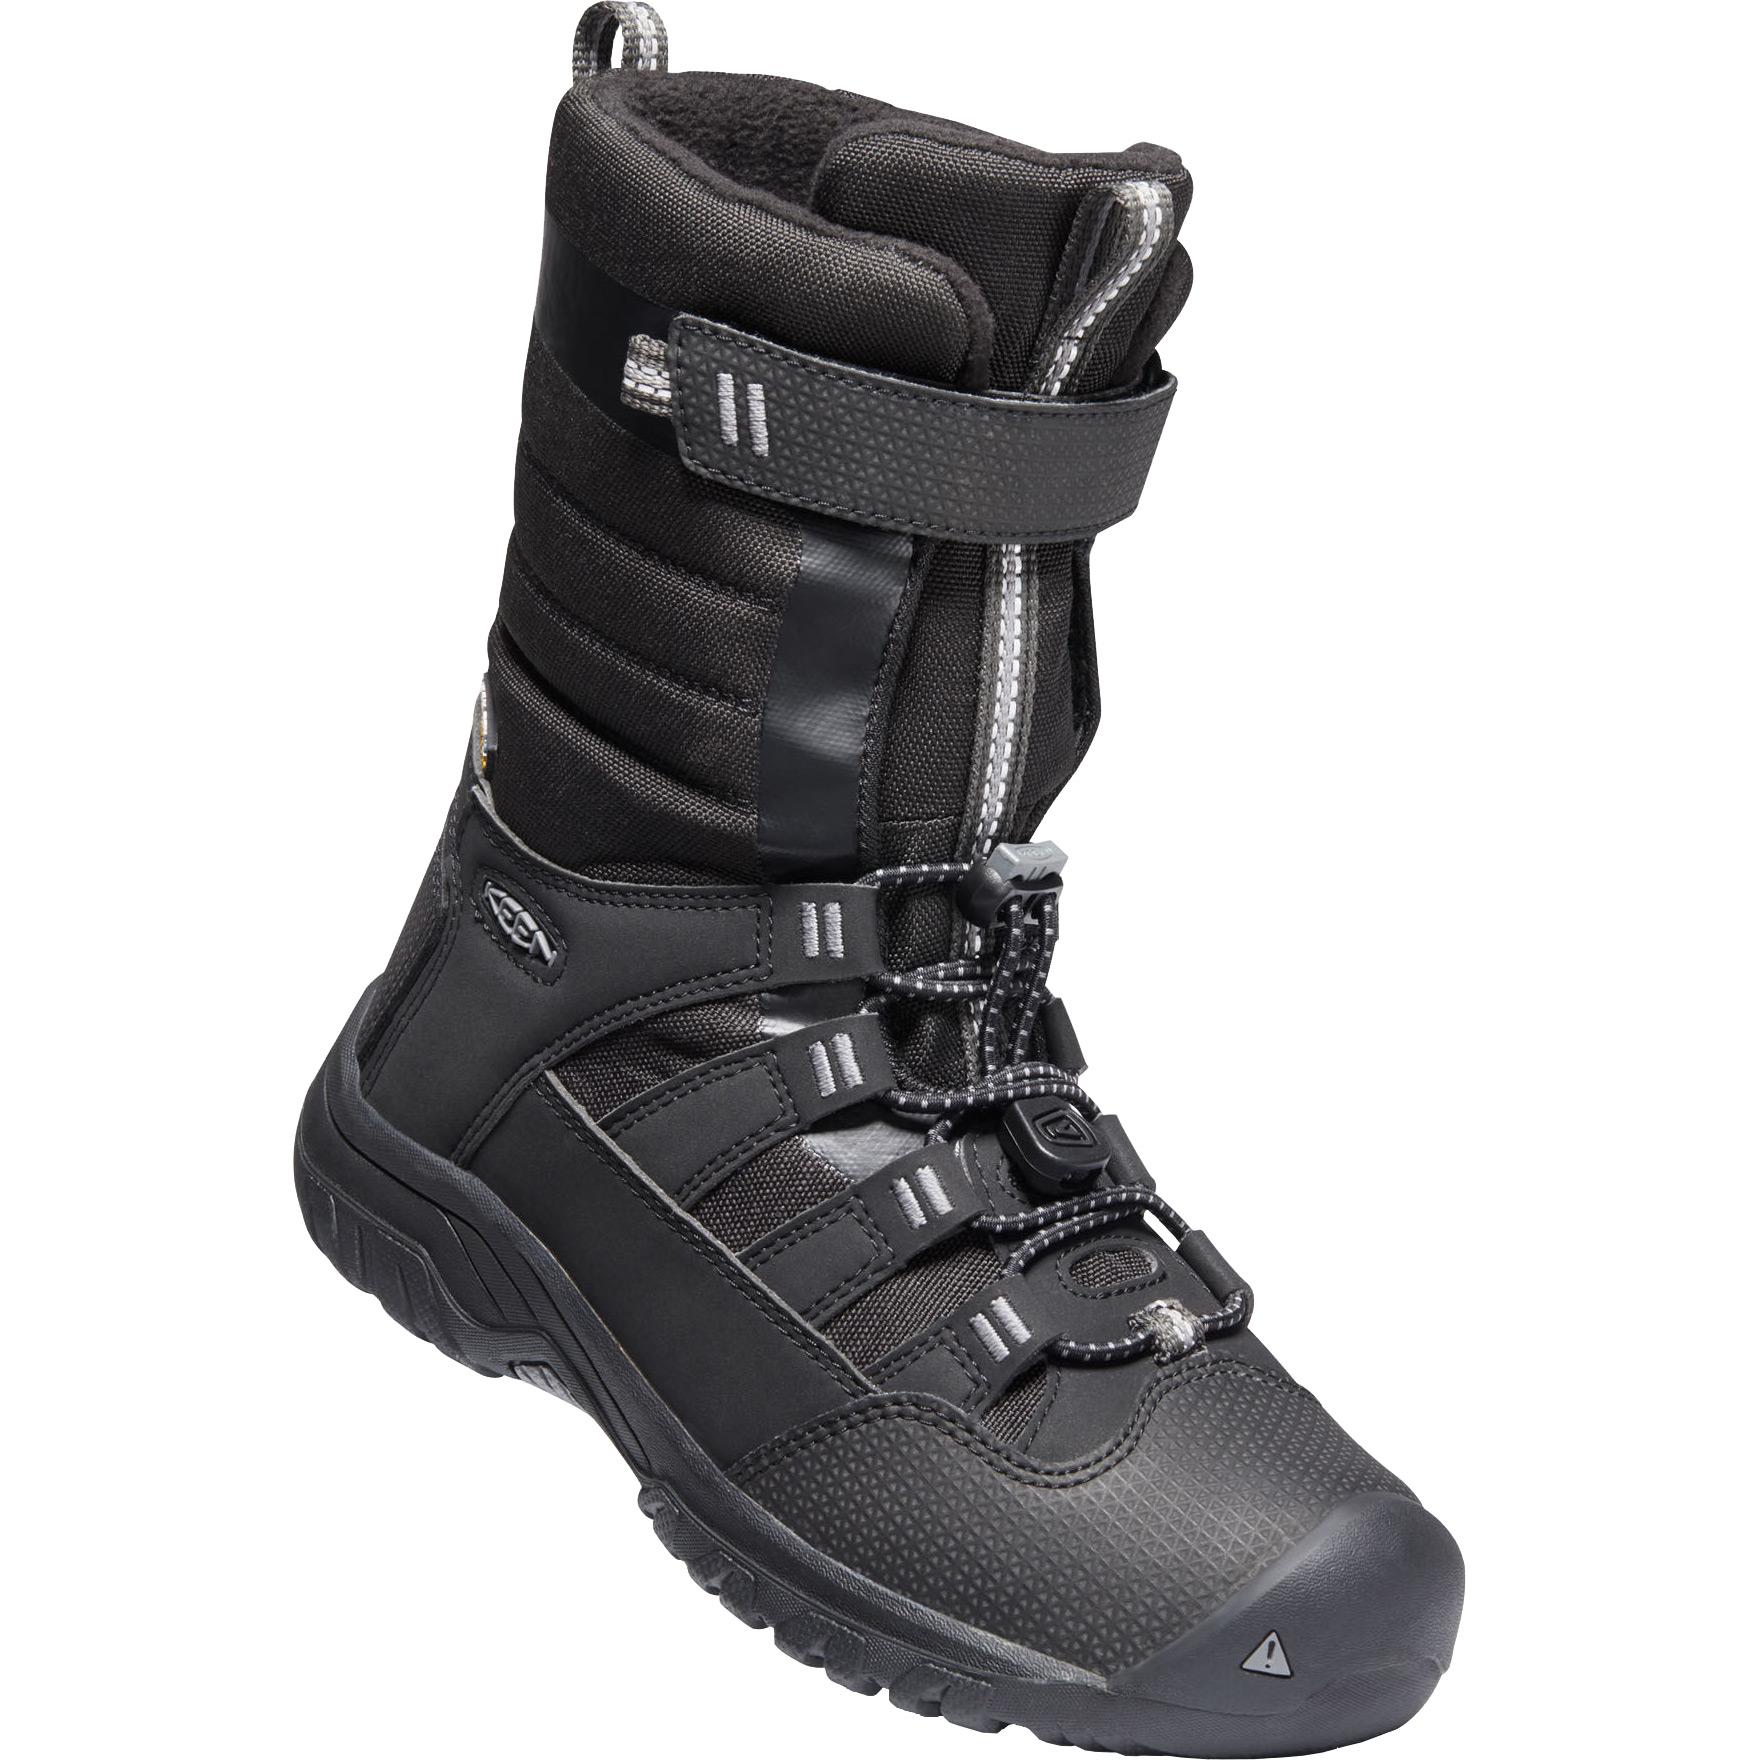 KEEN Winterport Neo Waterproof Youth Winter Boots - Raven / Black